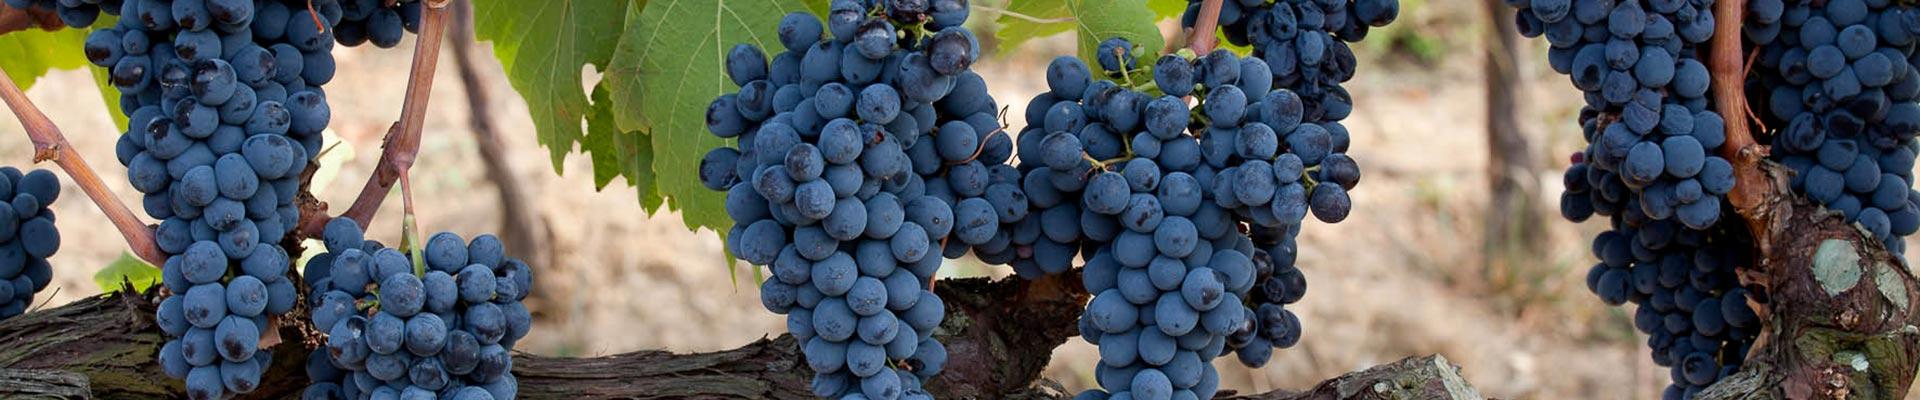 Vini Soldera per annata